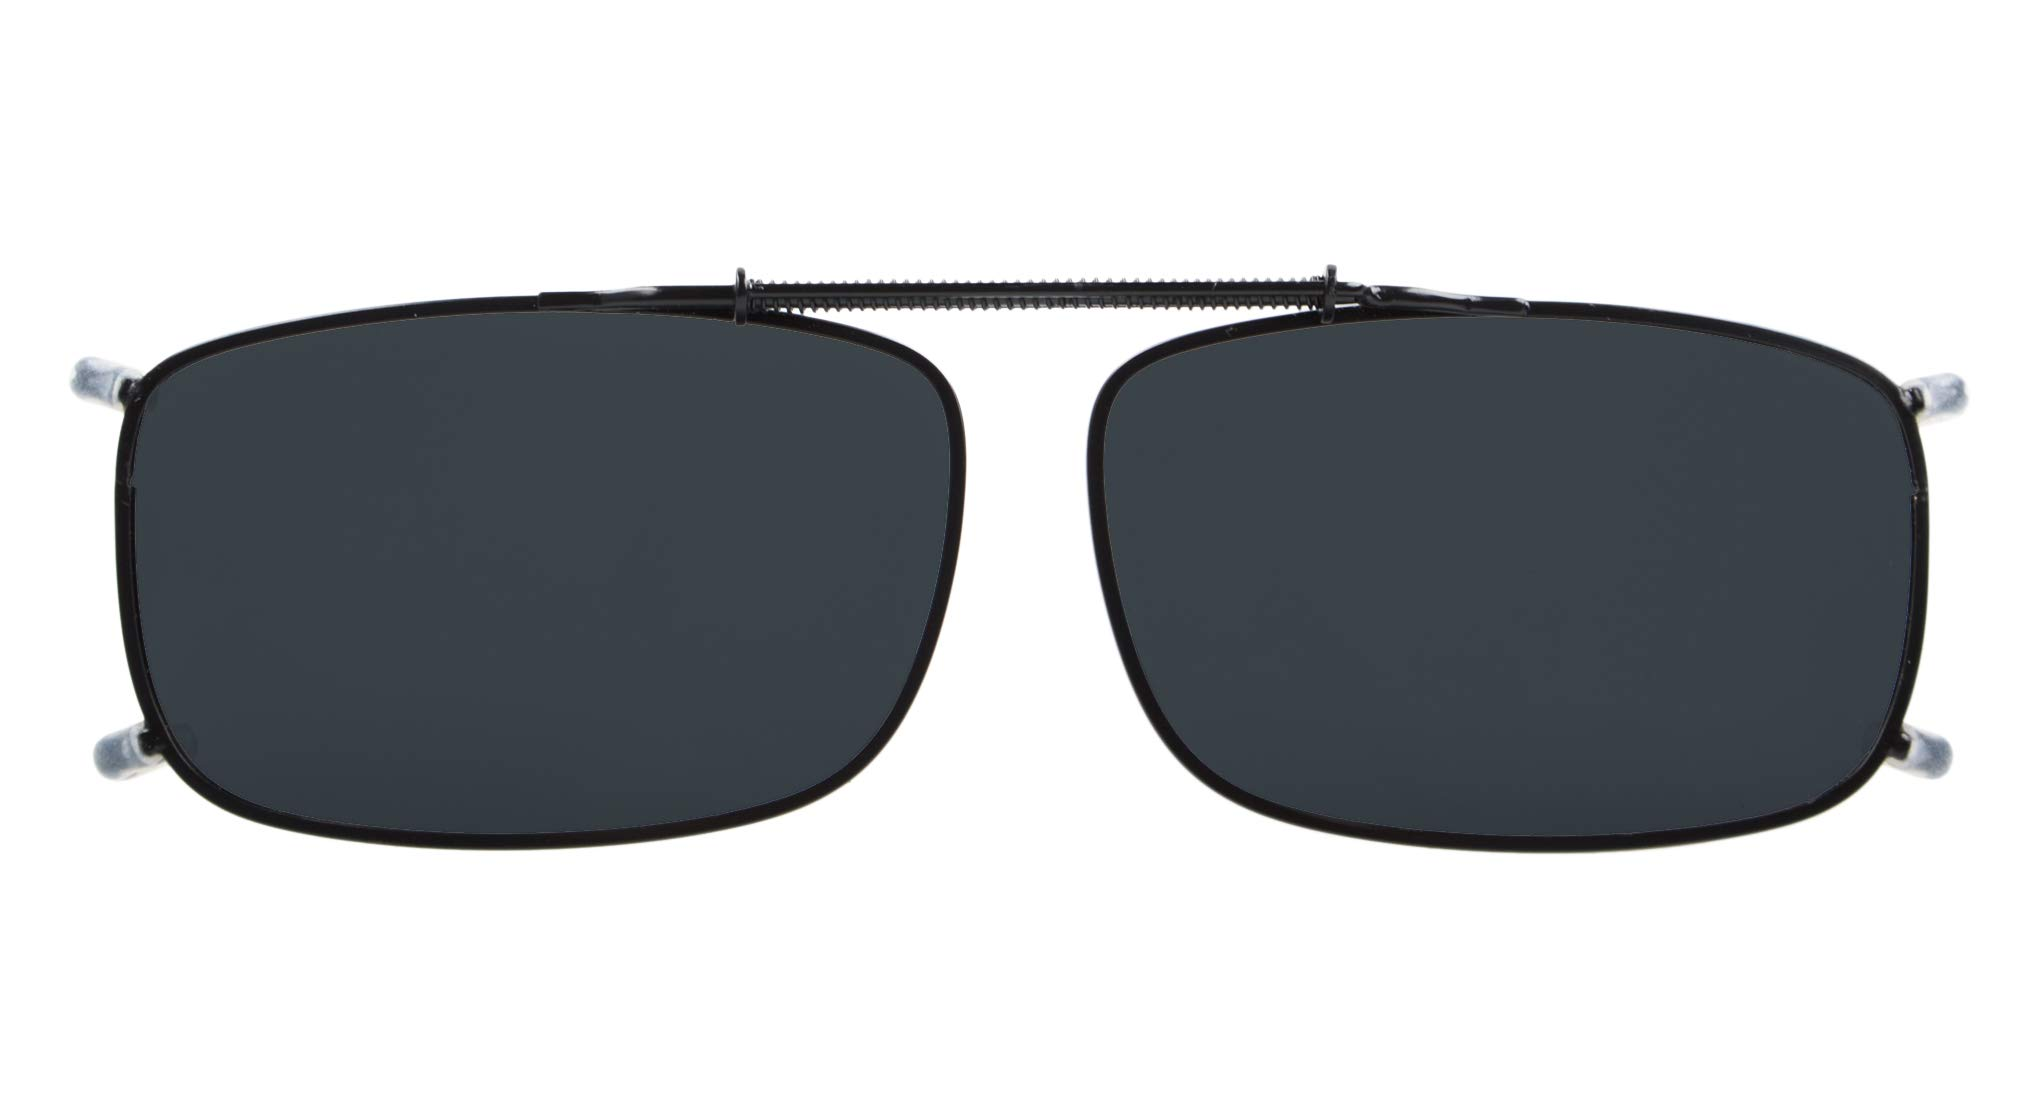 55mmx35mm Metal Frame Polarized Sunglasses